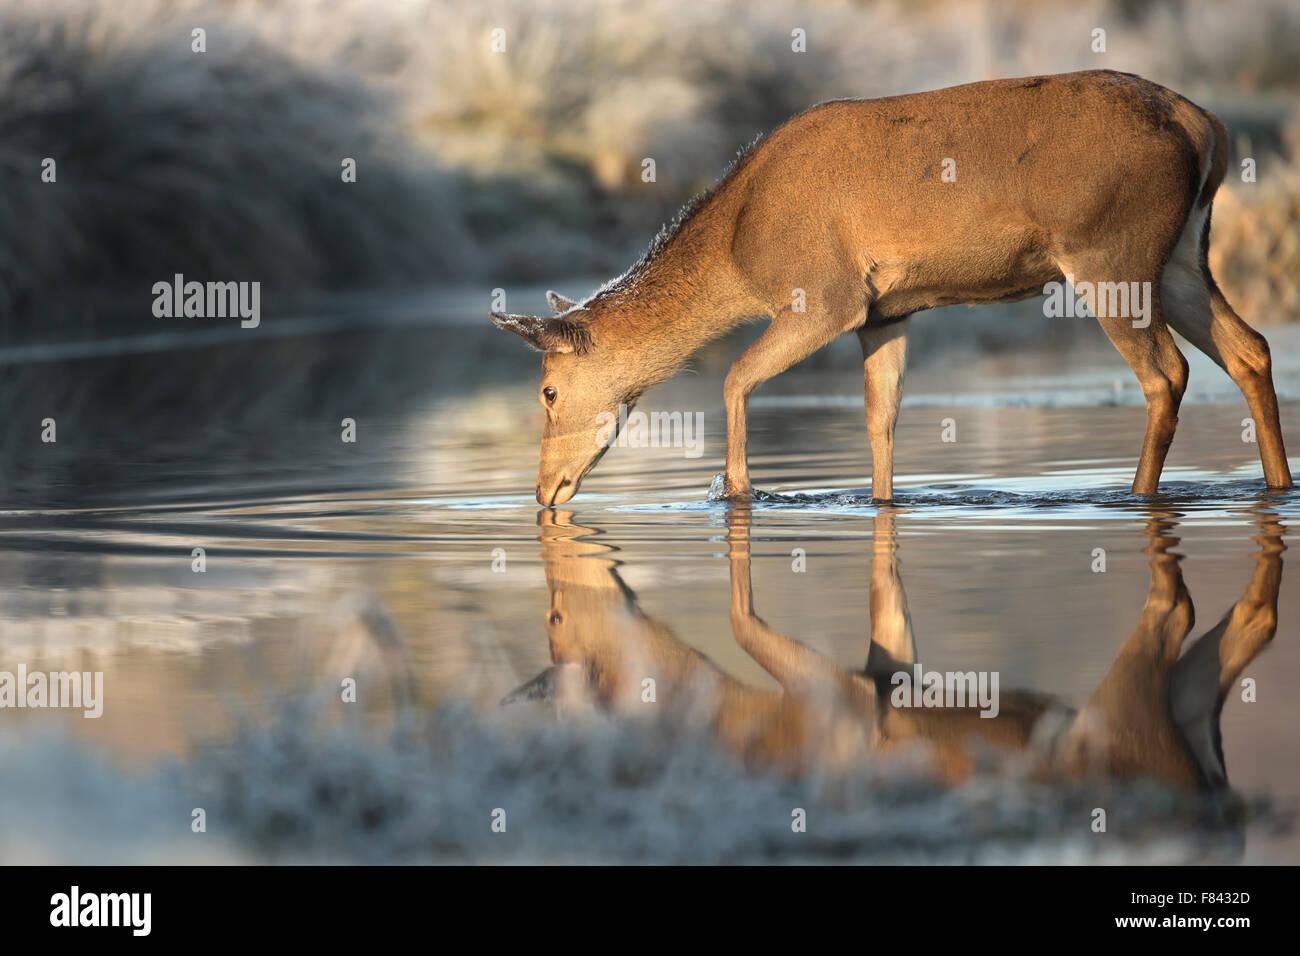 Red deer hind drinking water - Stock Image